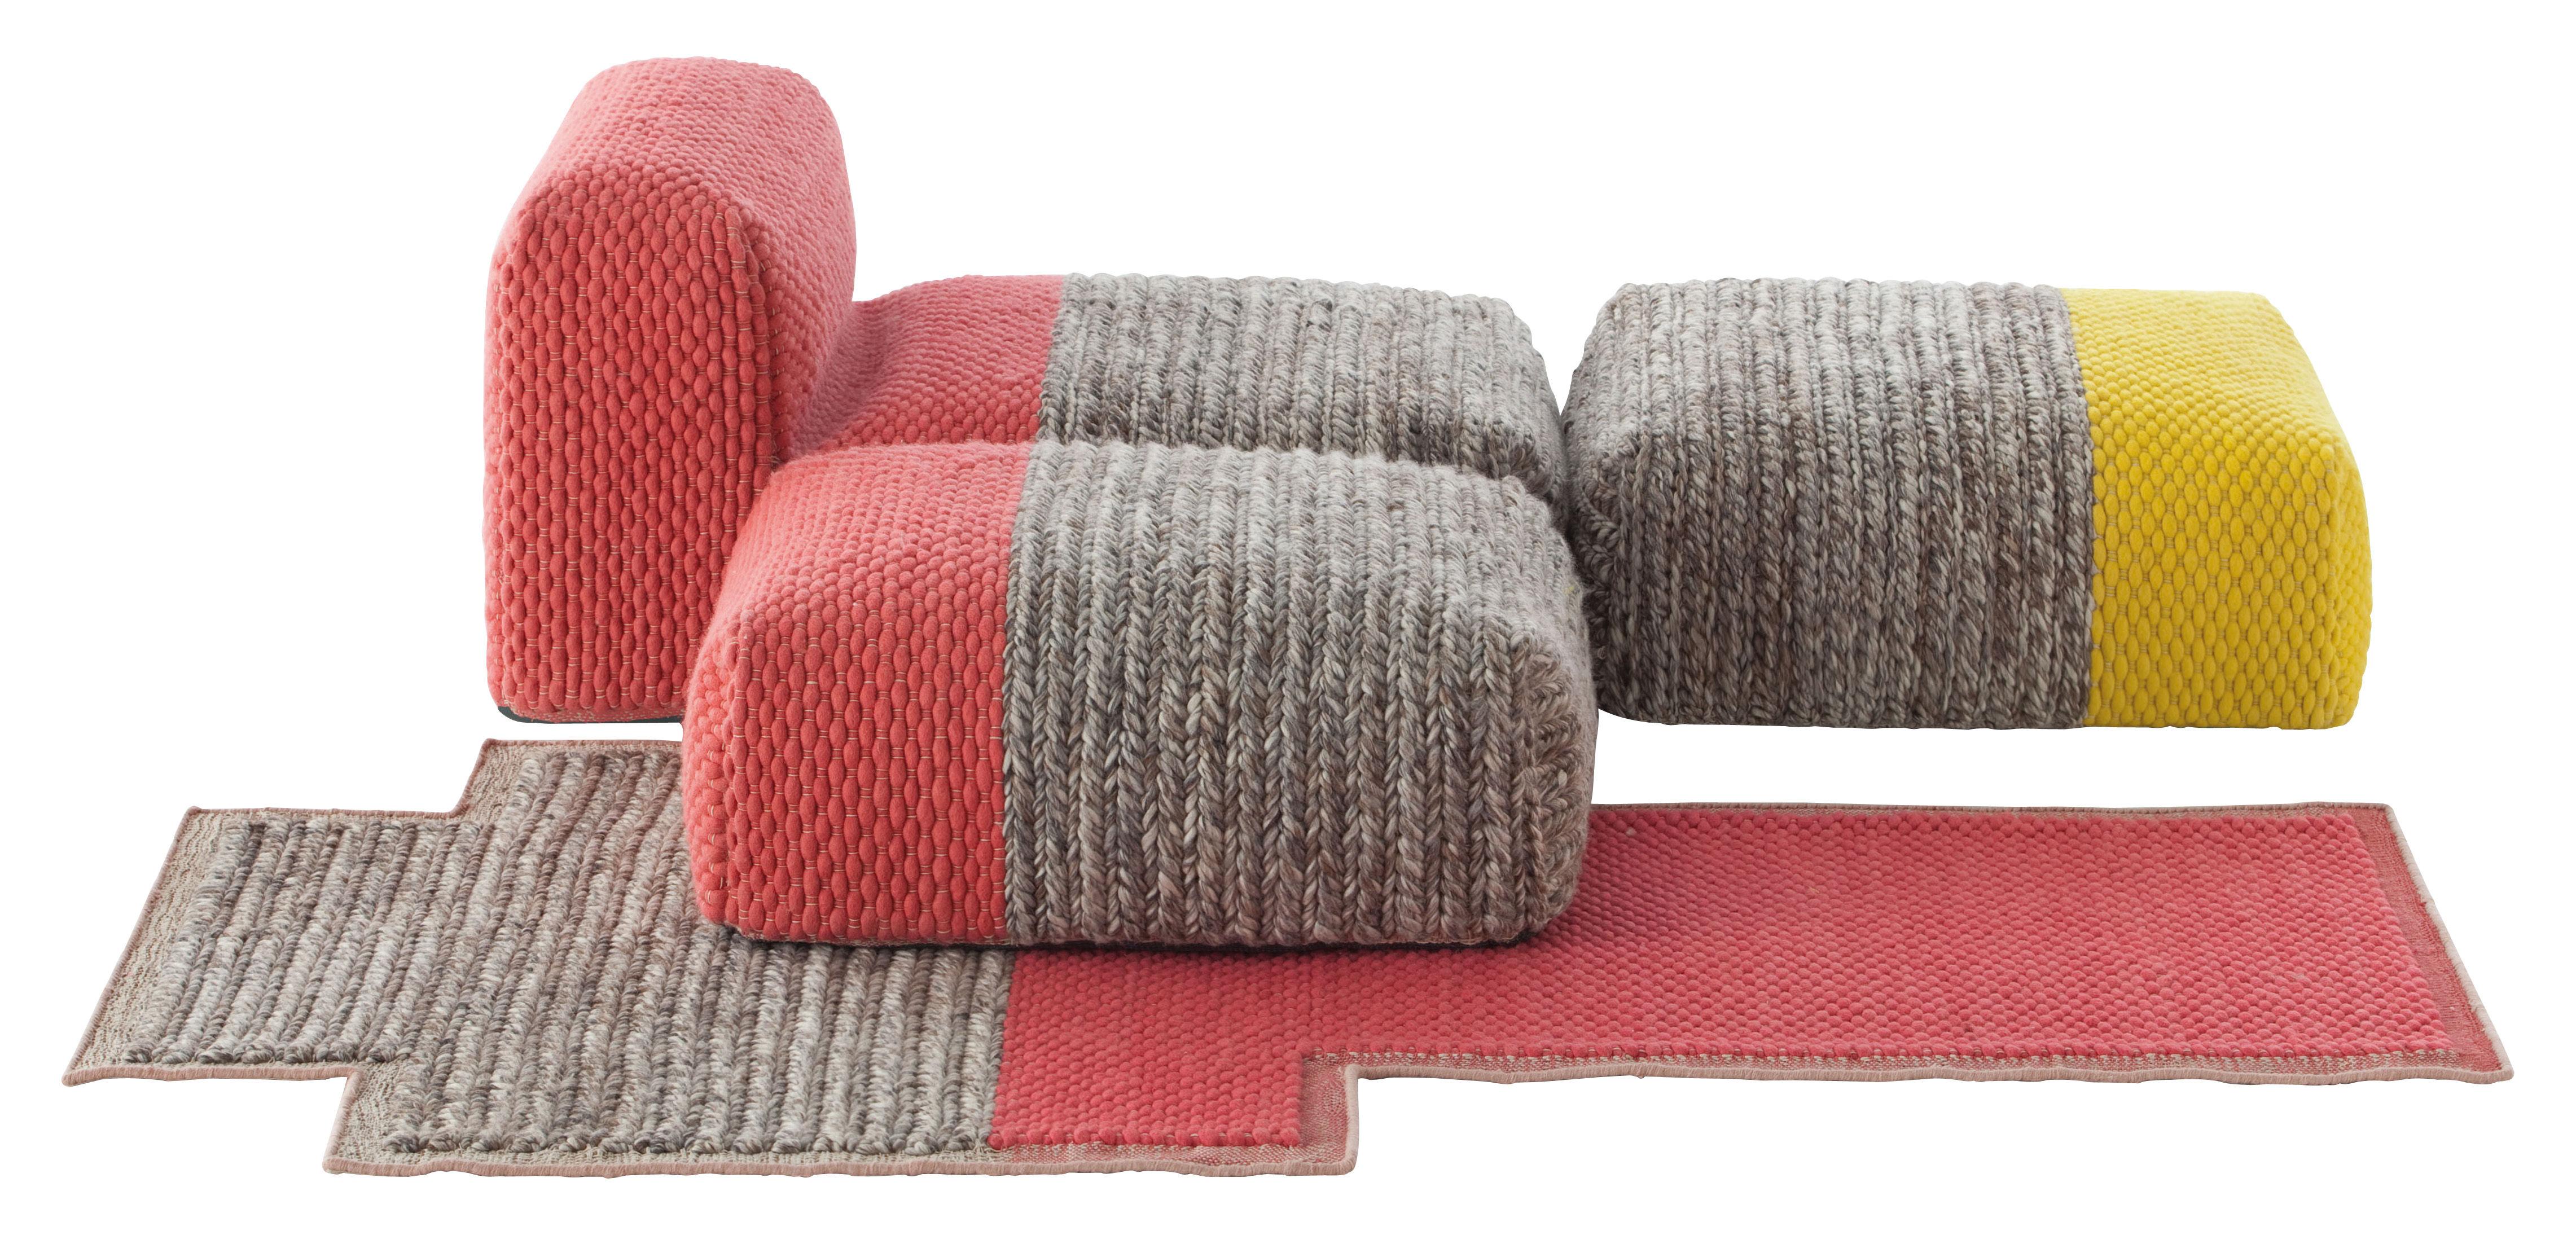 Möbel - Lounge Sessel - n°1 Mangas Space Sofa modulierbar / 1 Chaiselongue + 2 Sitzhocker + 1 Teppich - Gan - Gelb & Koralle - Laine vierge, Mousse caoutchouc